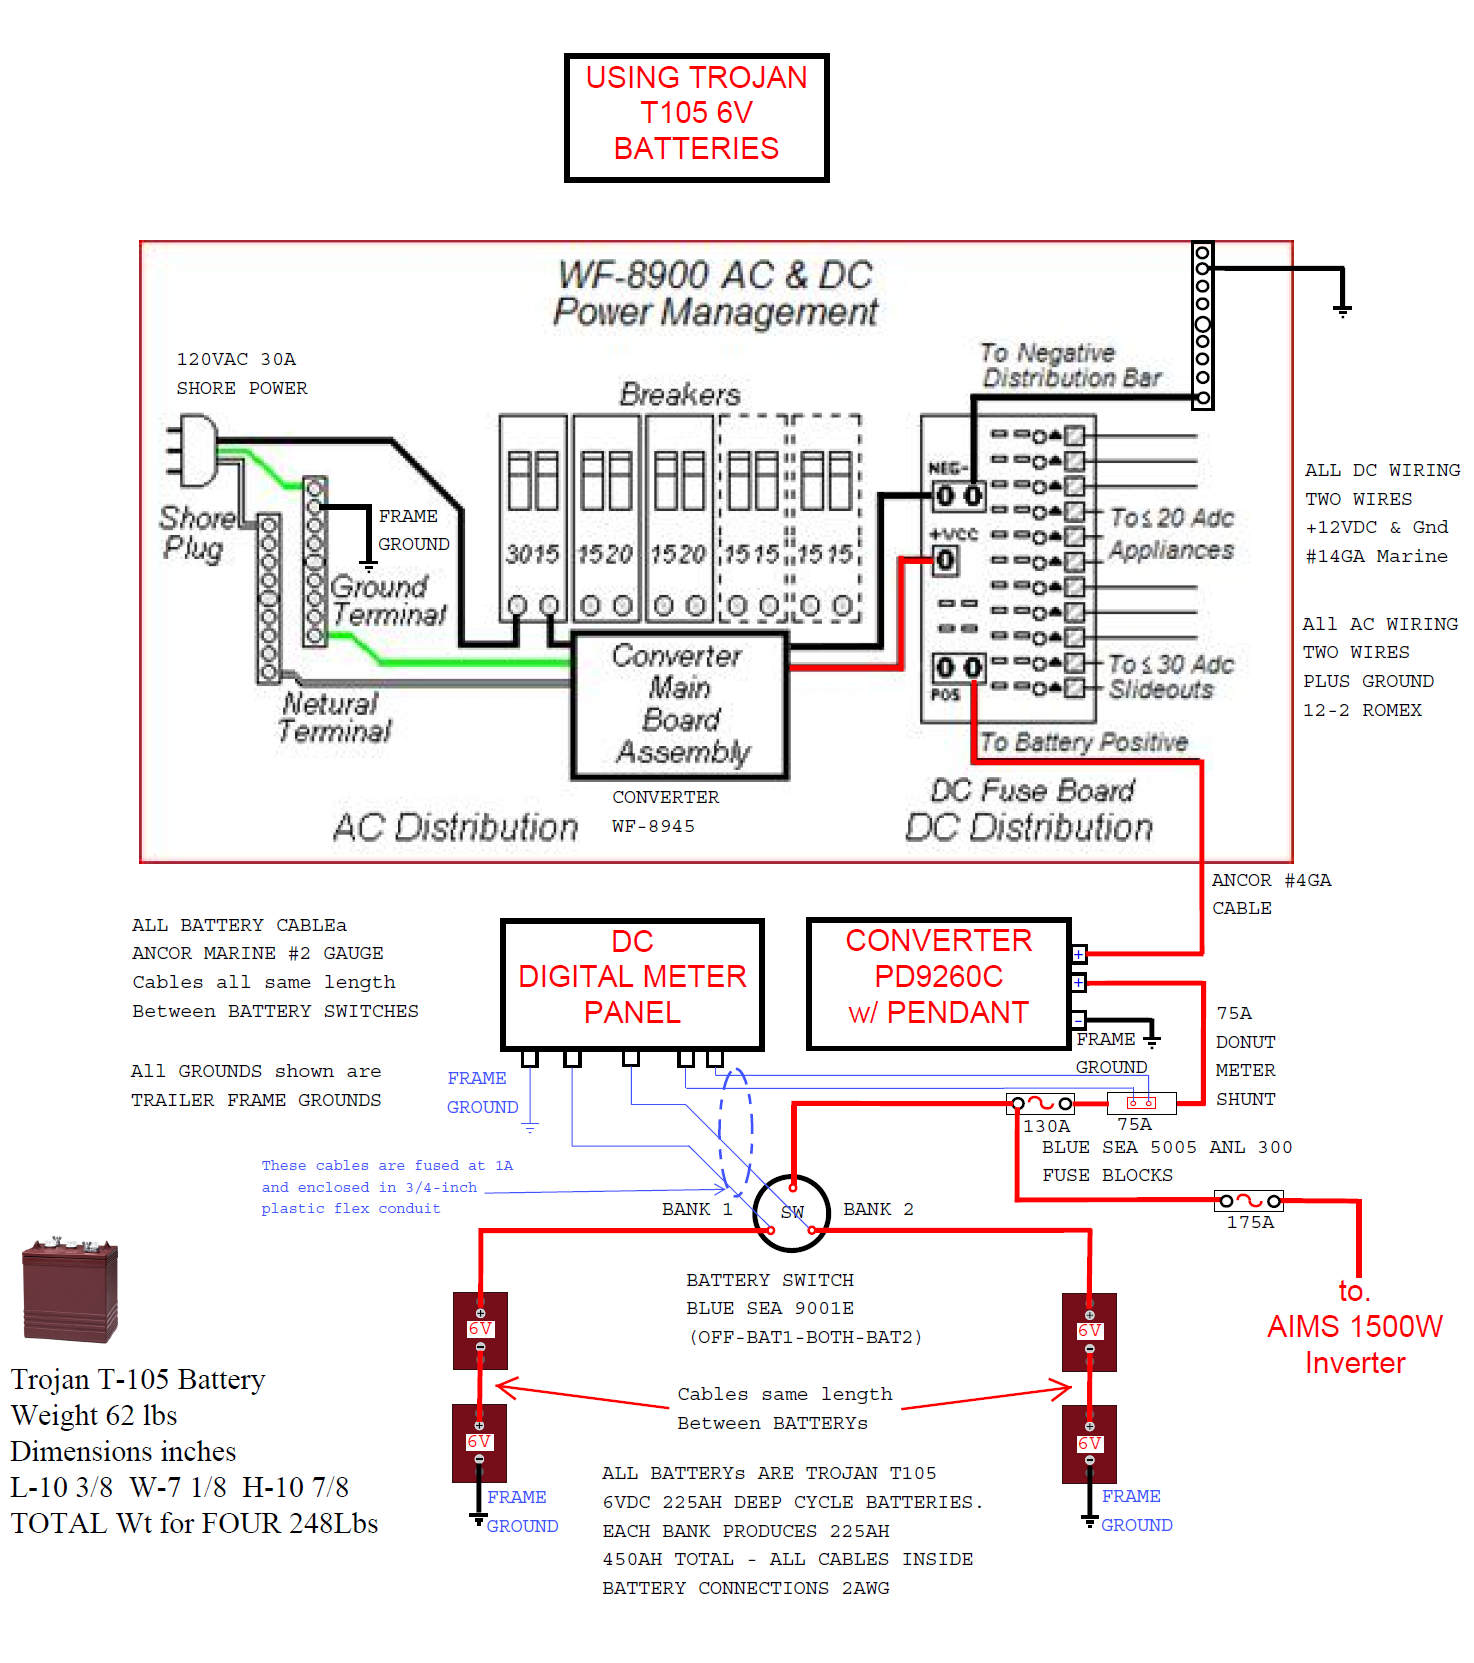 Twin Sel Battery Wiring Diagram - 1996 Mazda Protege Fuse Diagram -  controlwiring.yenpancane.jeanjaures37.fr | Twin Sel Battery Wiring Diagram |  | Wiring Diagram Resource